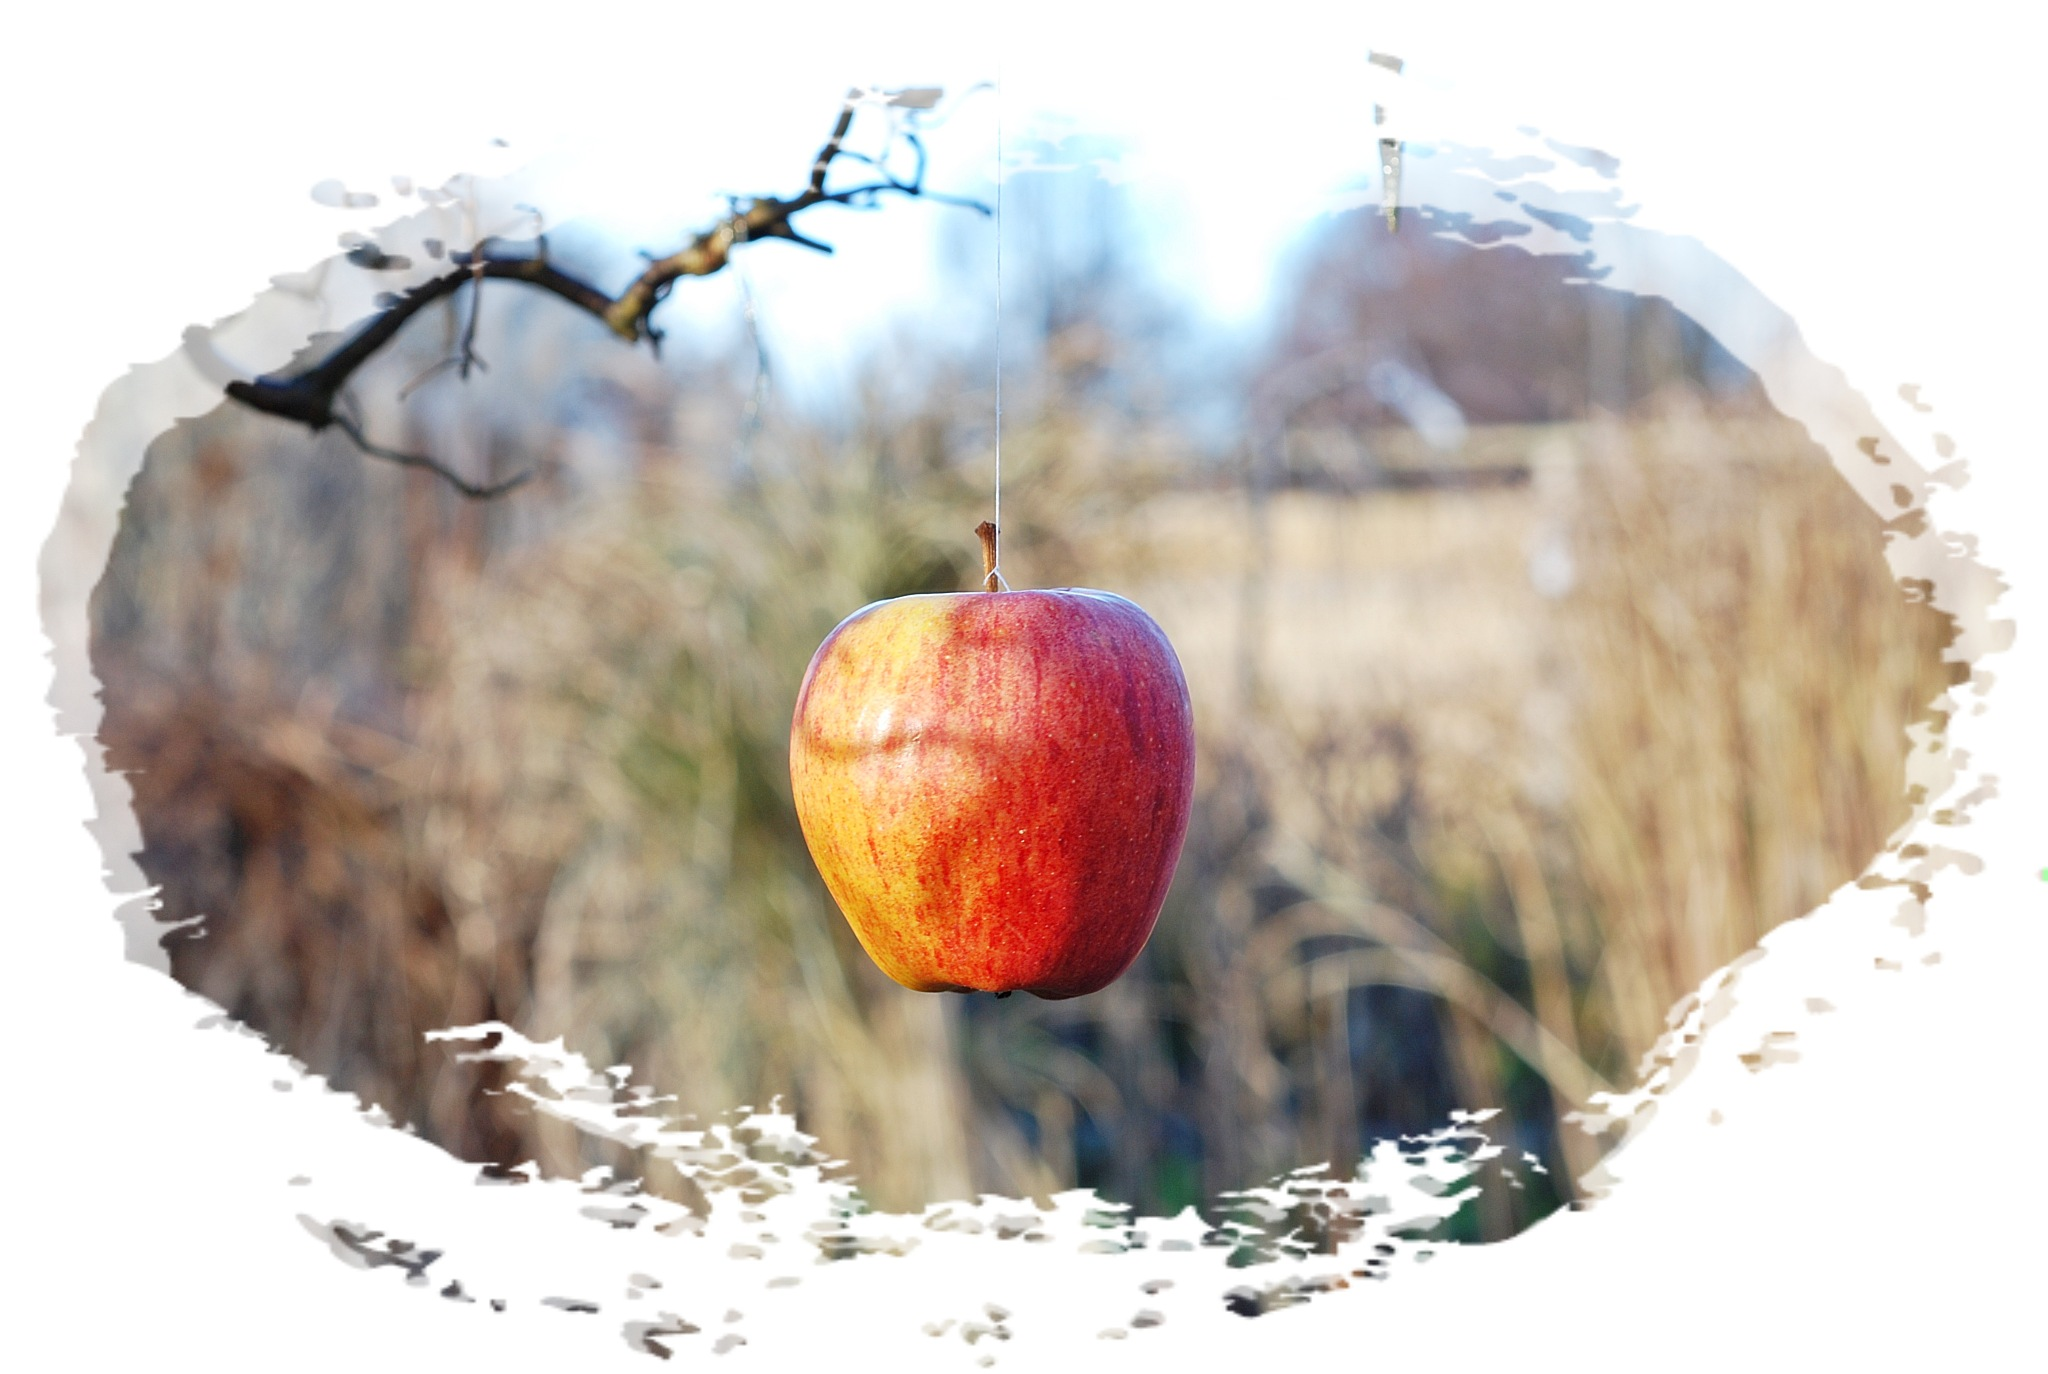 vinter äpplet  by Max Cesare Parodi